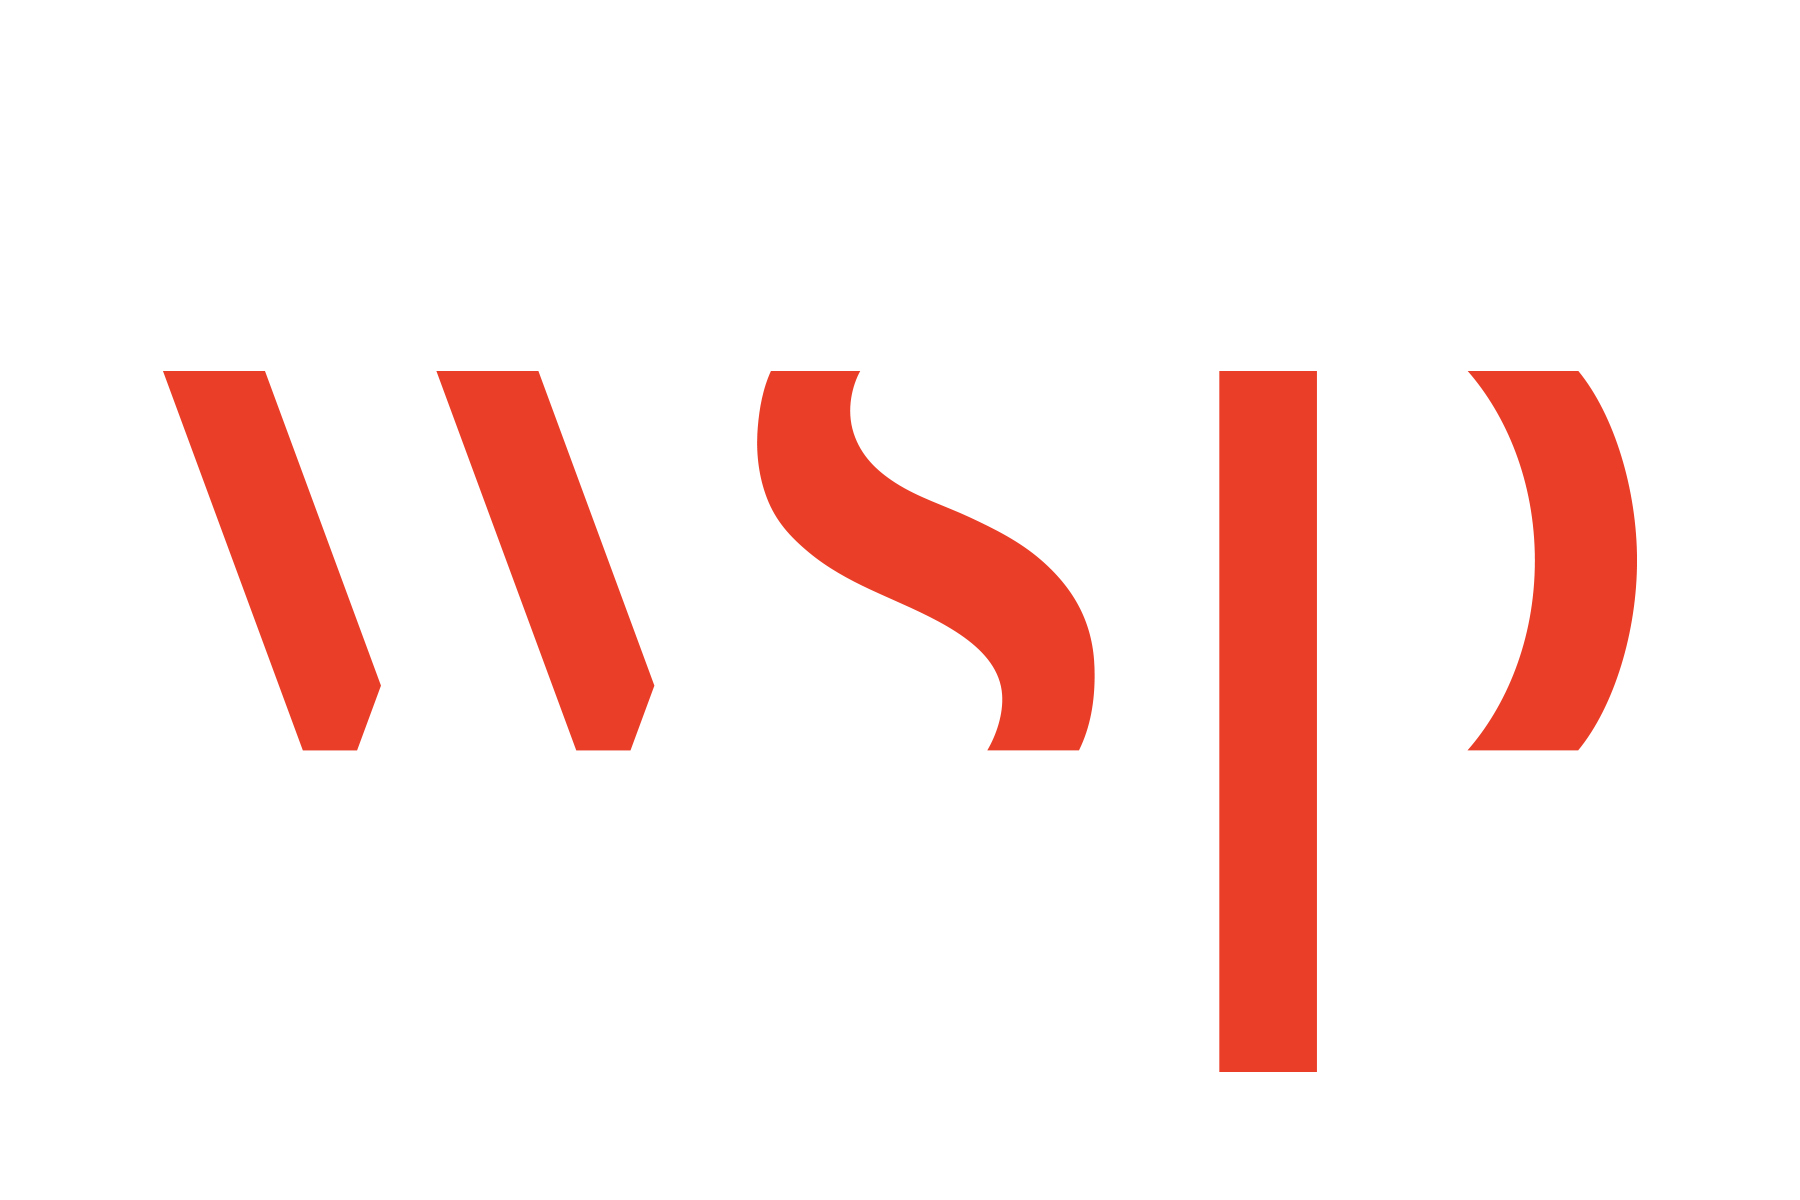 wsp_logo_red.jpg